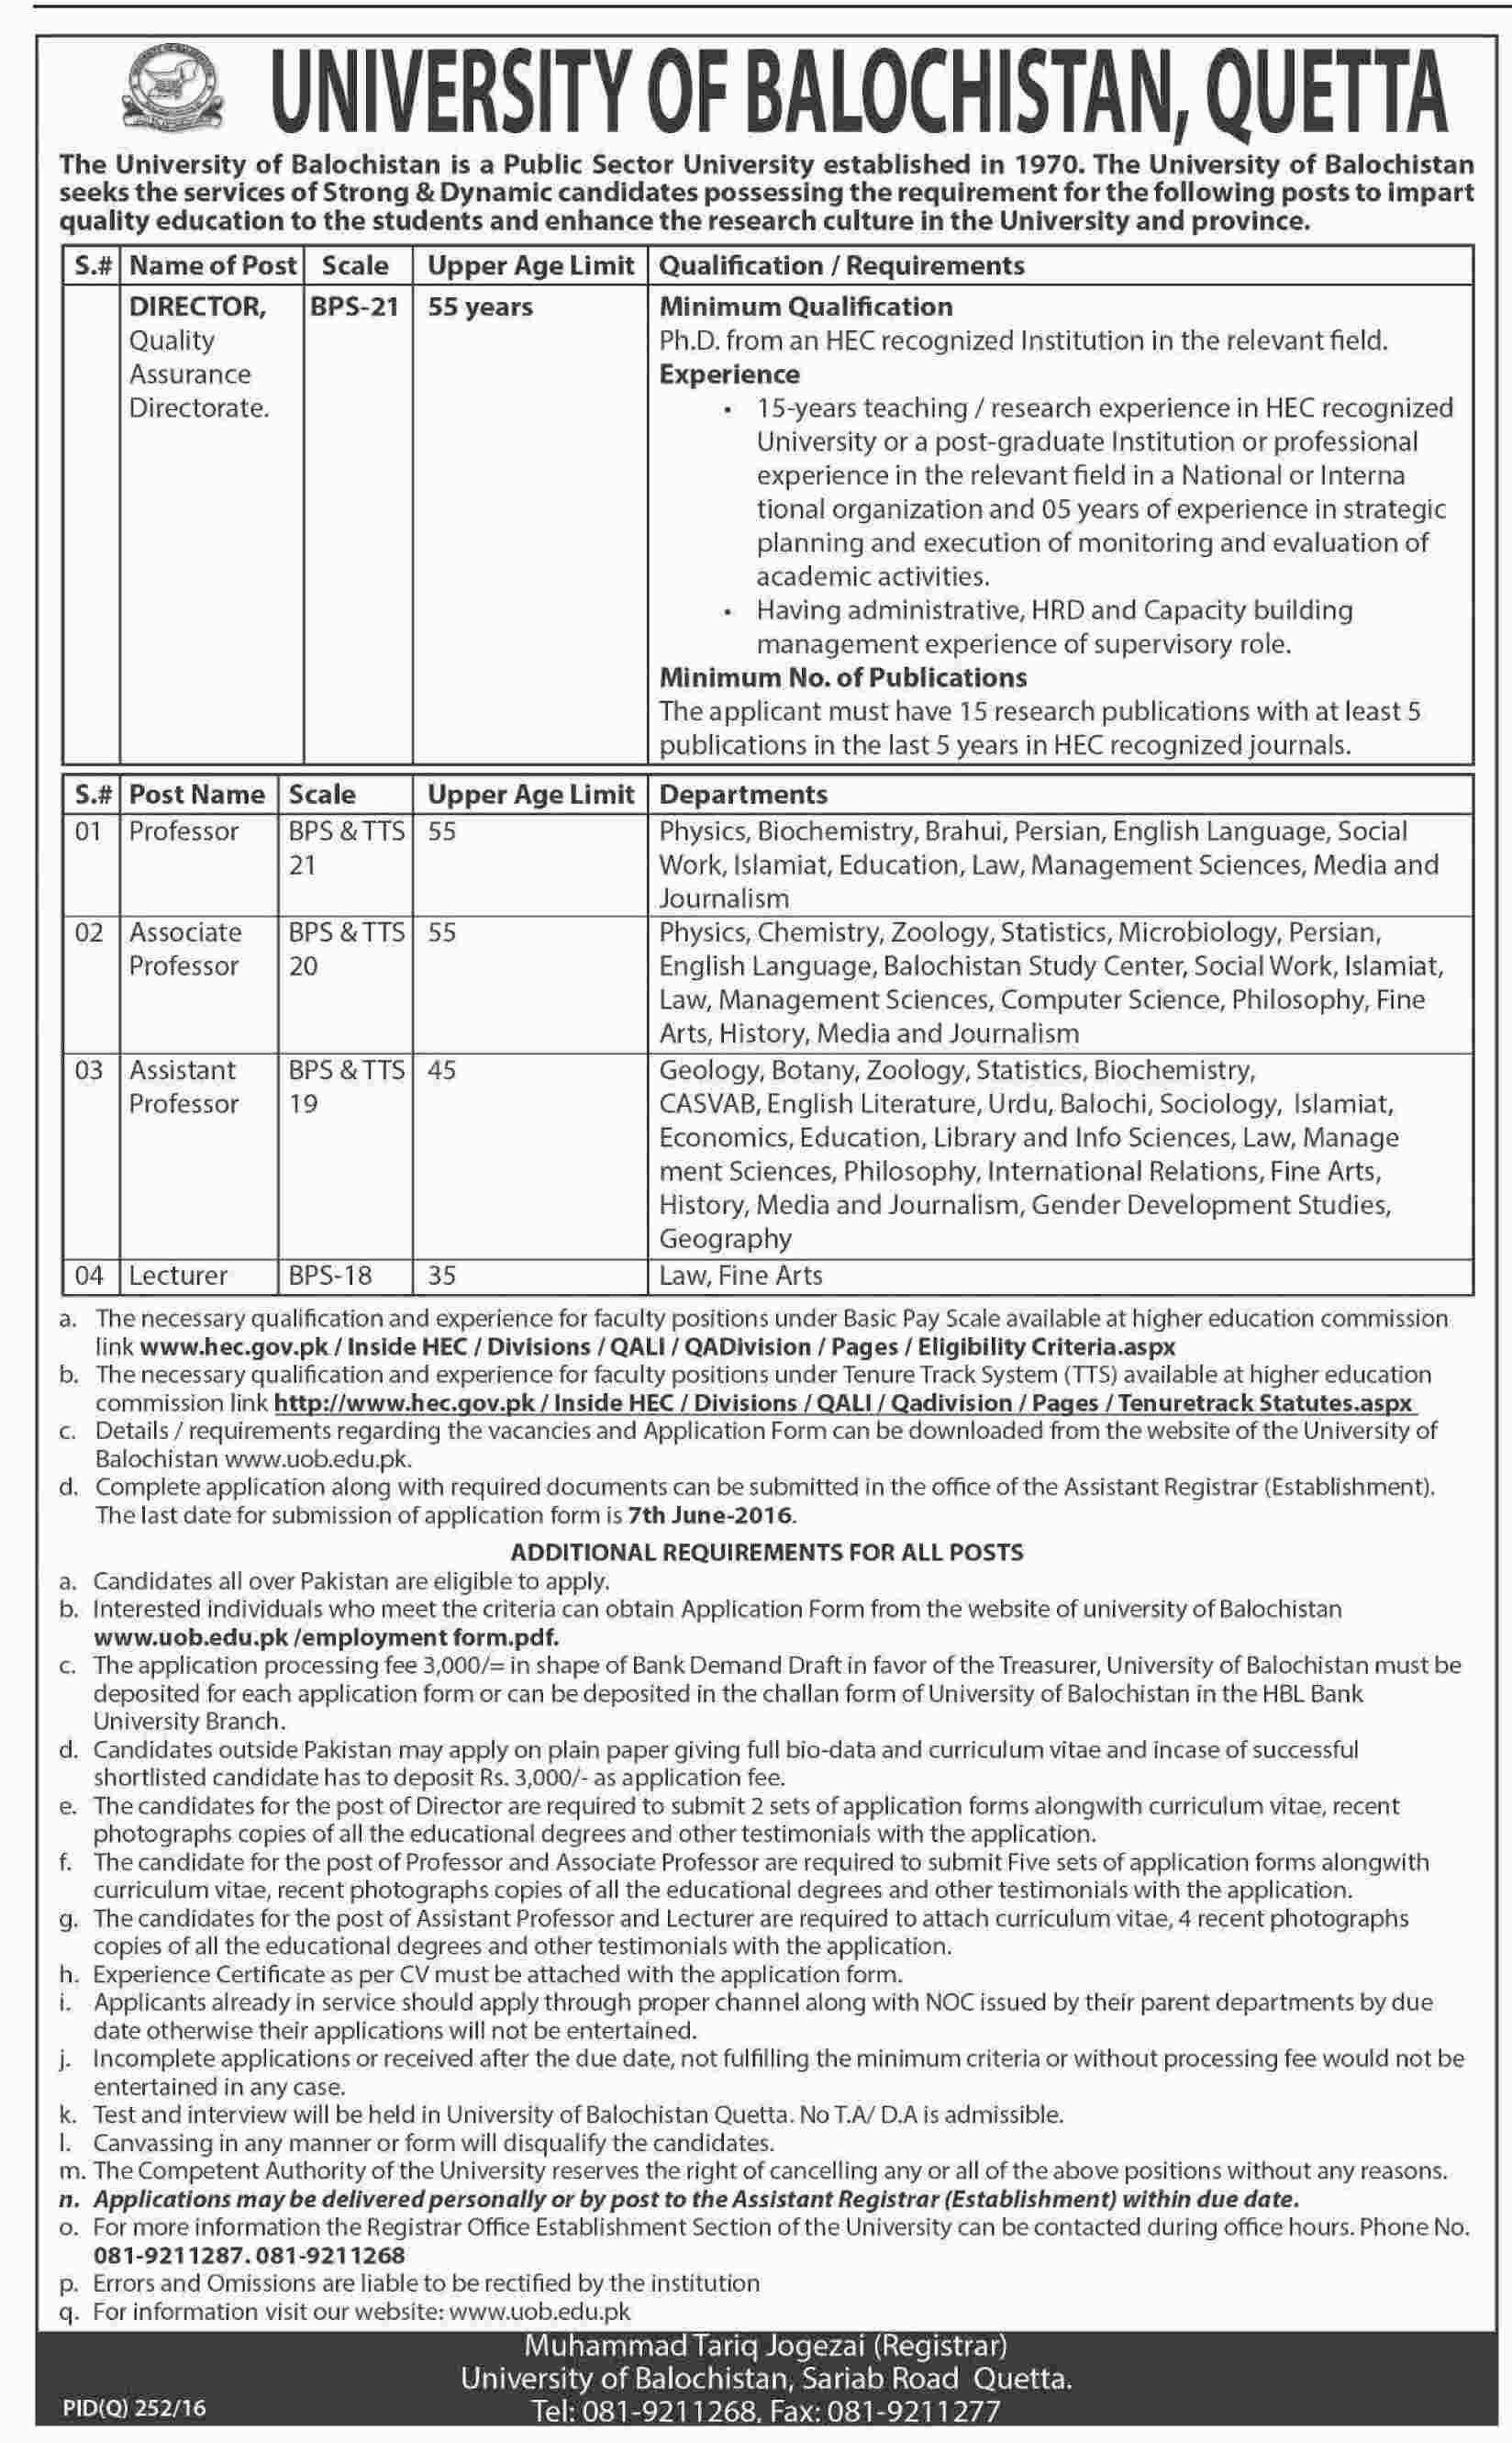 University of Balochistan Jobs 2016